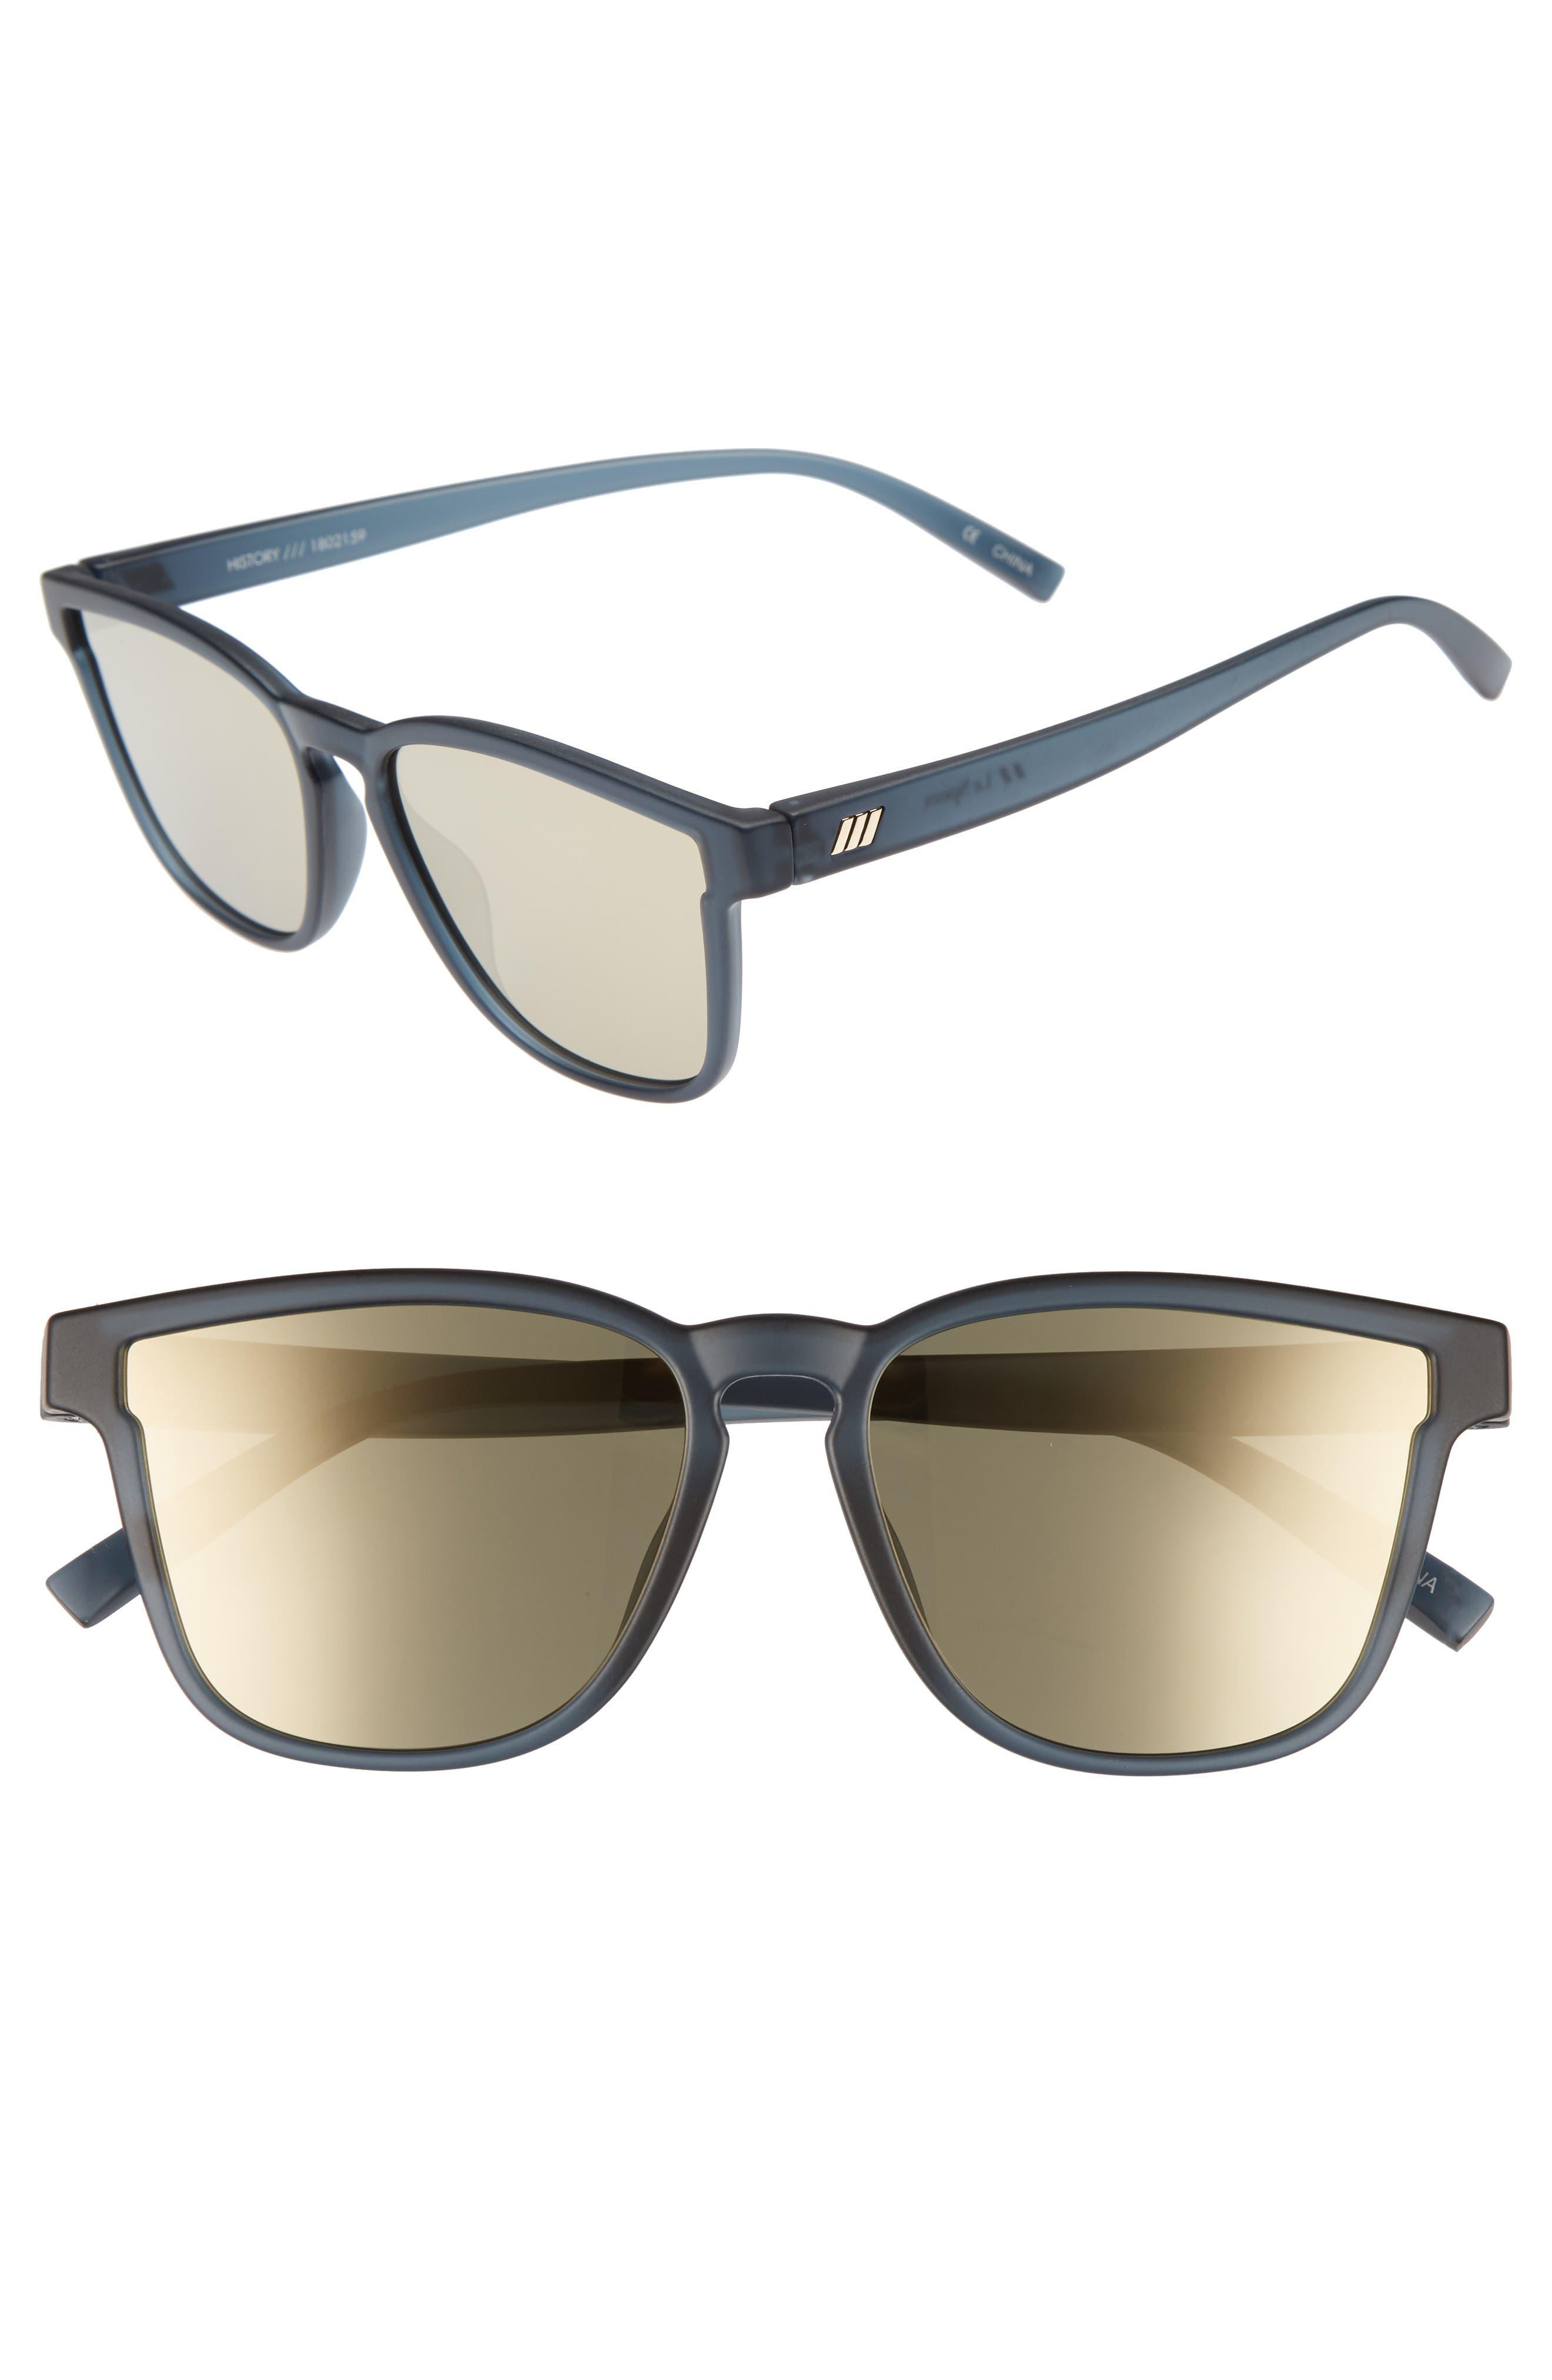 Le Specs History 53mm Modern Rectangle Sunglasses